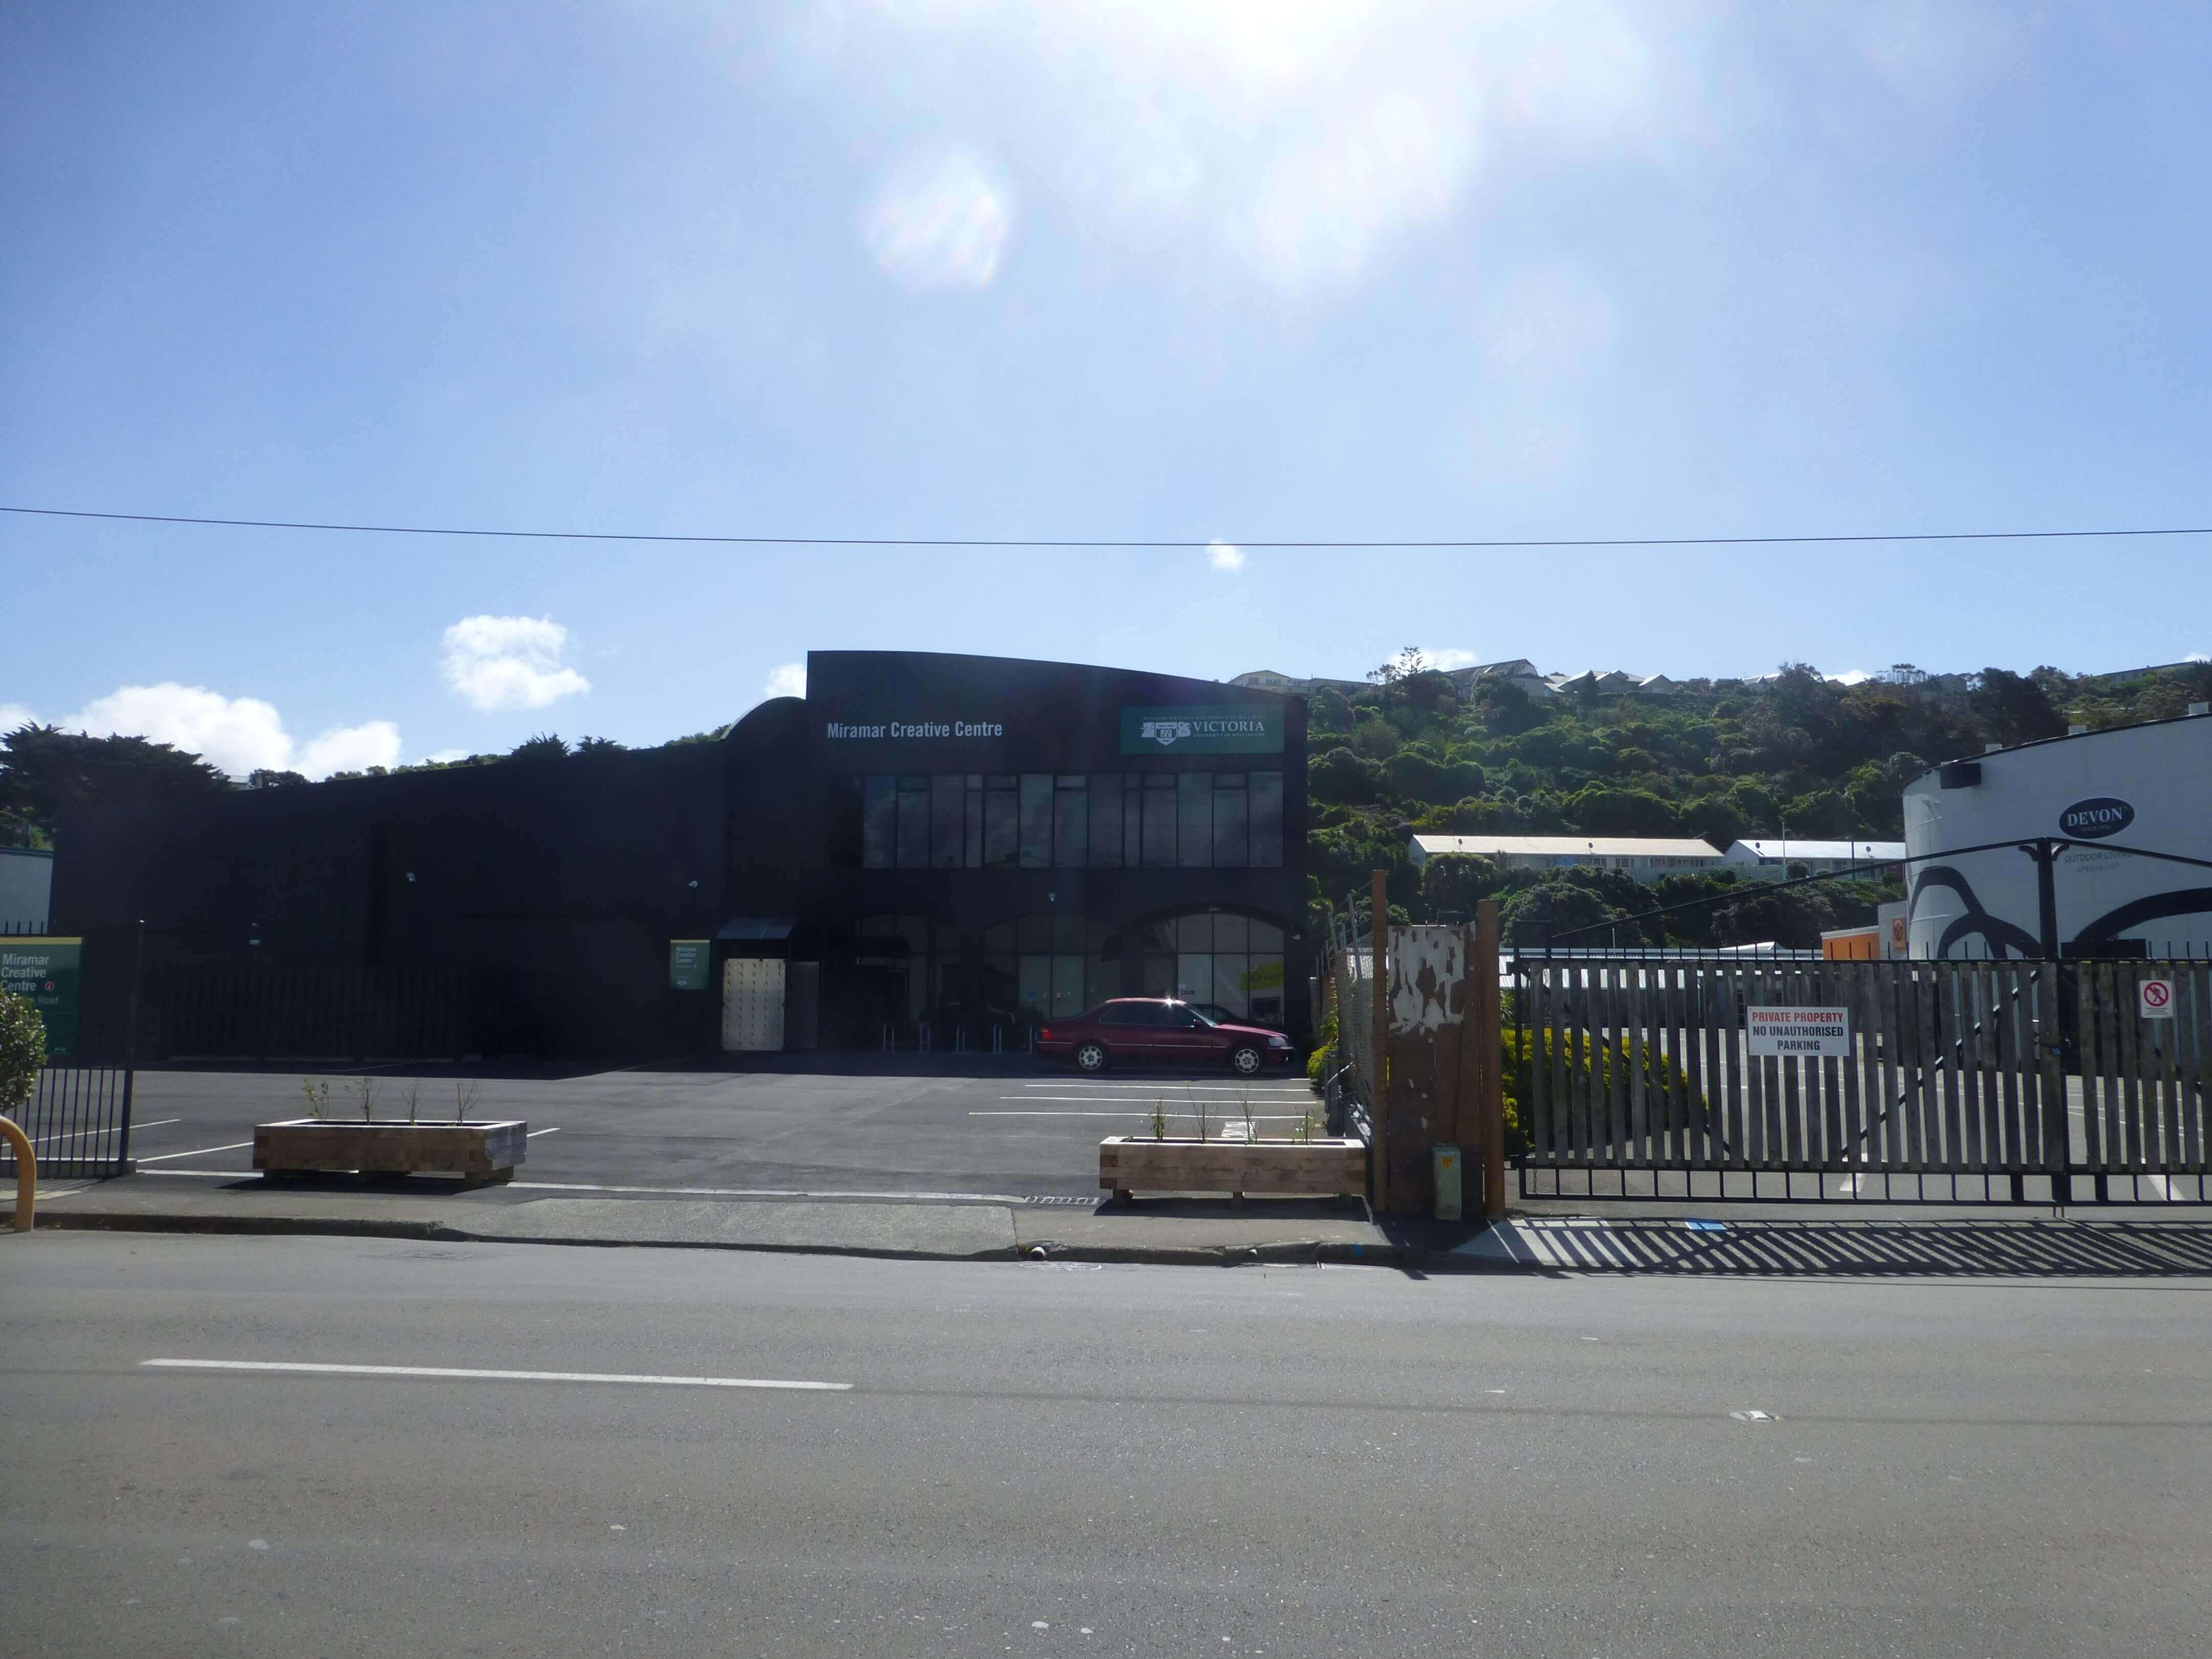 Wellington, in Miramar auf dem Weg zum Weta Shop, Weit-weg.reisen, 13